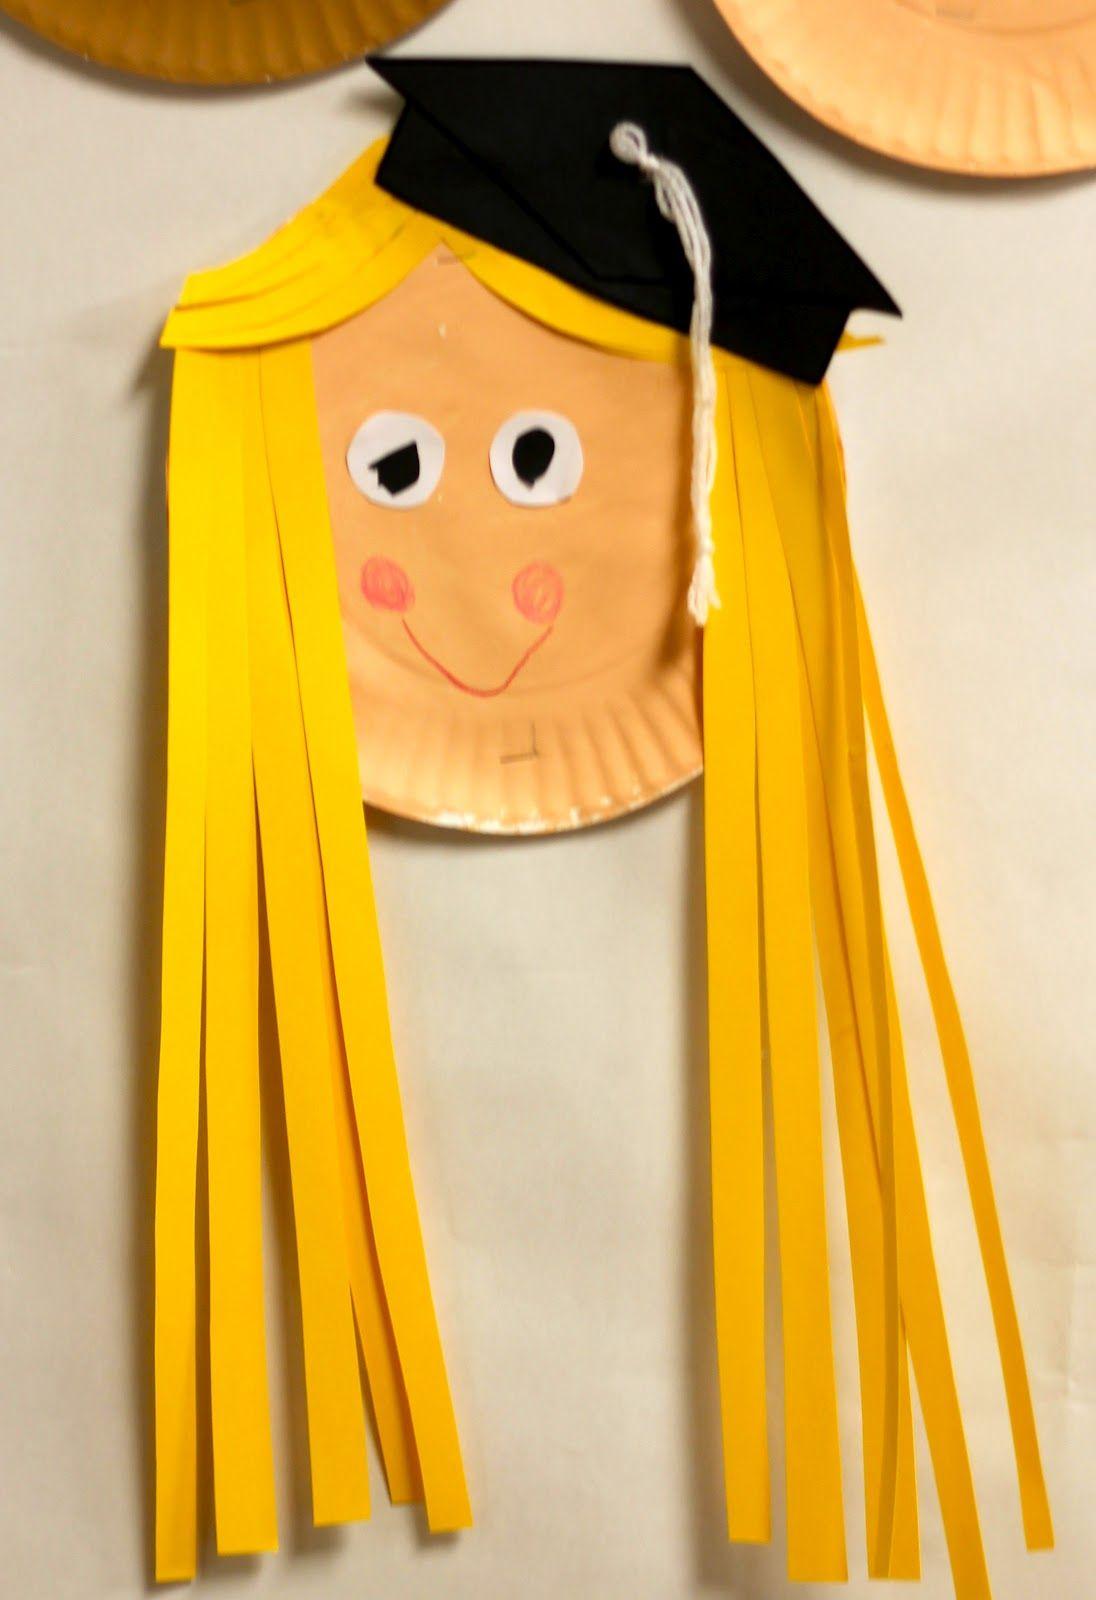 Worksheet Preschool Graduation Caps